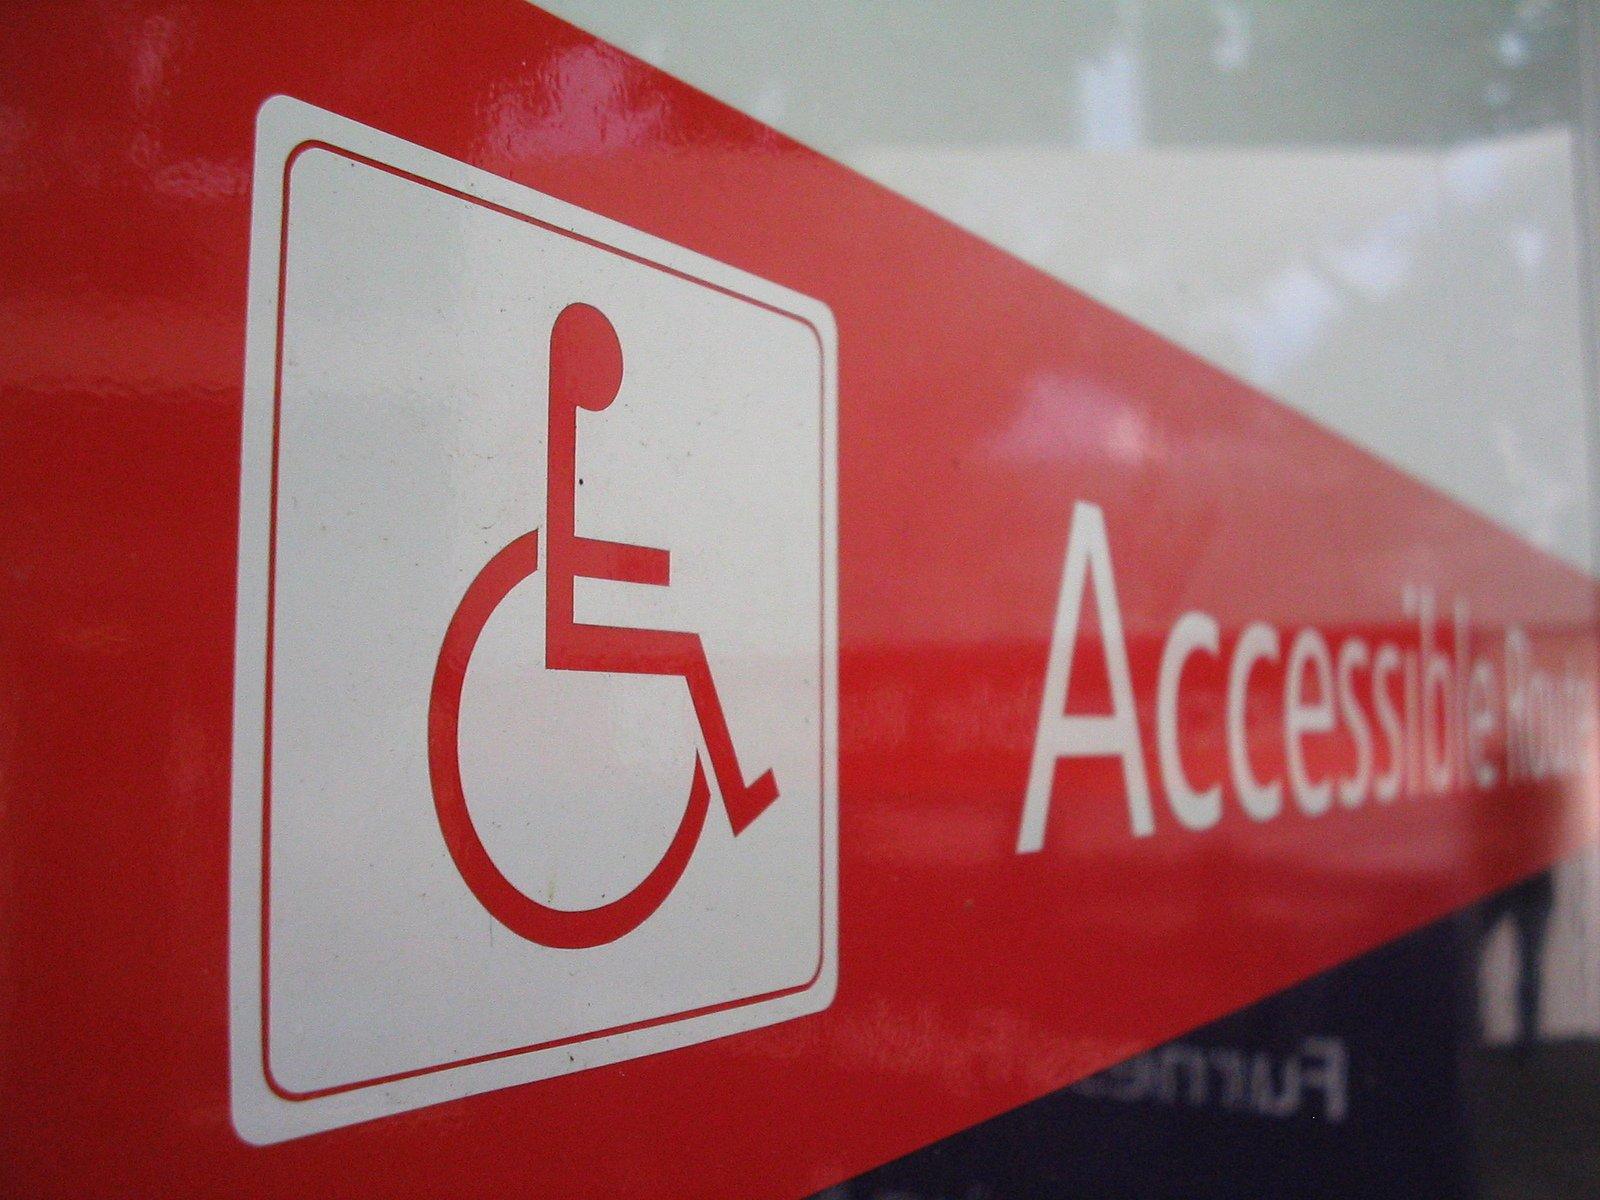 accessibility-1538227.jpg